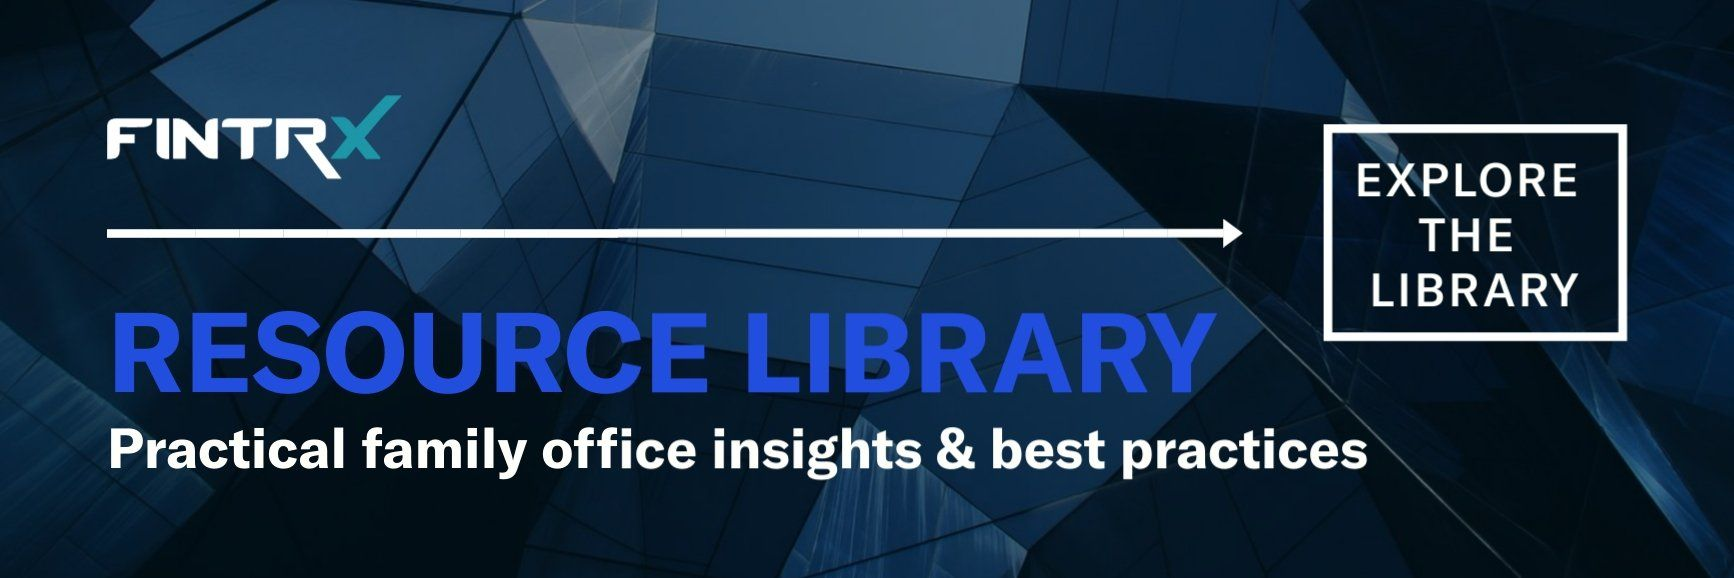 FINTRX Resource Library